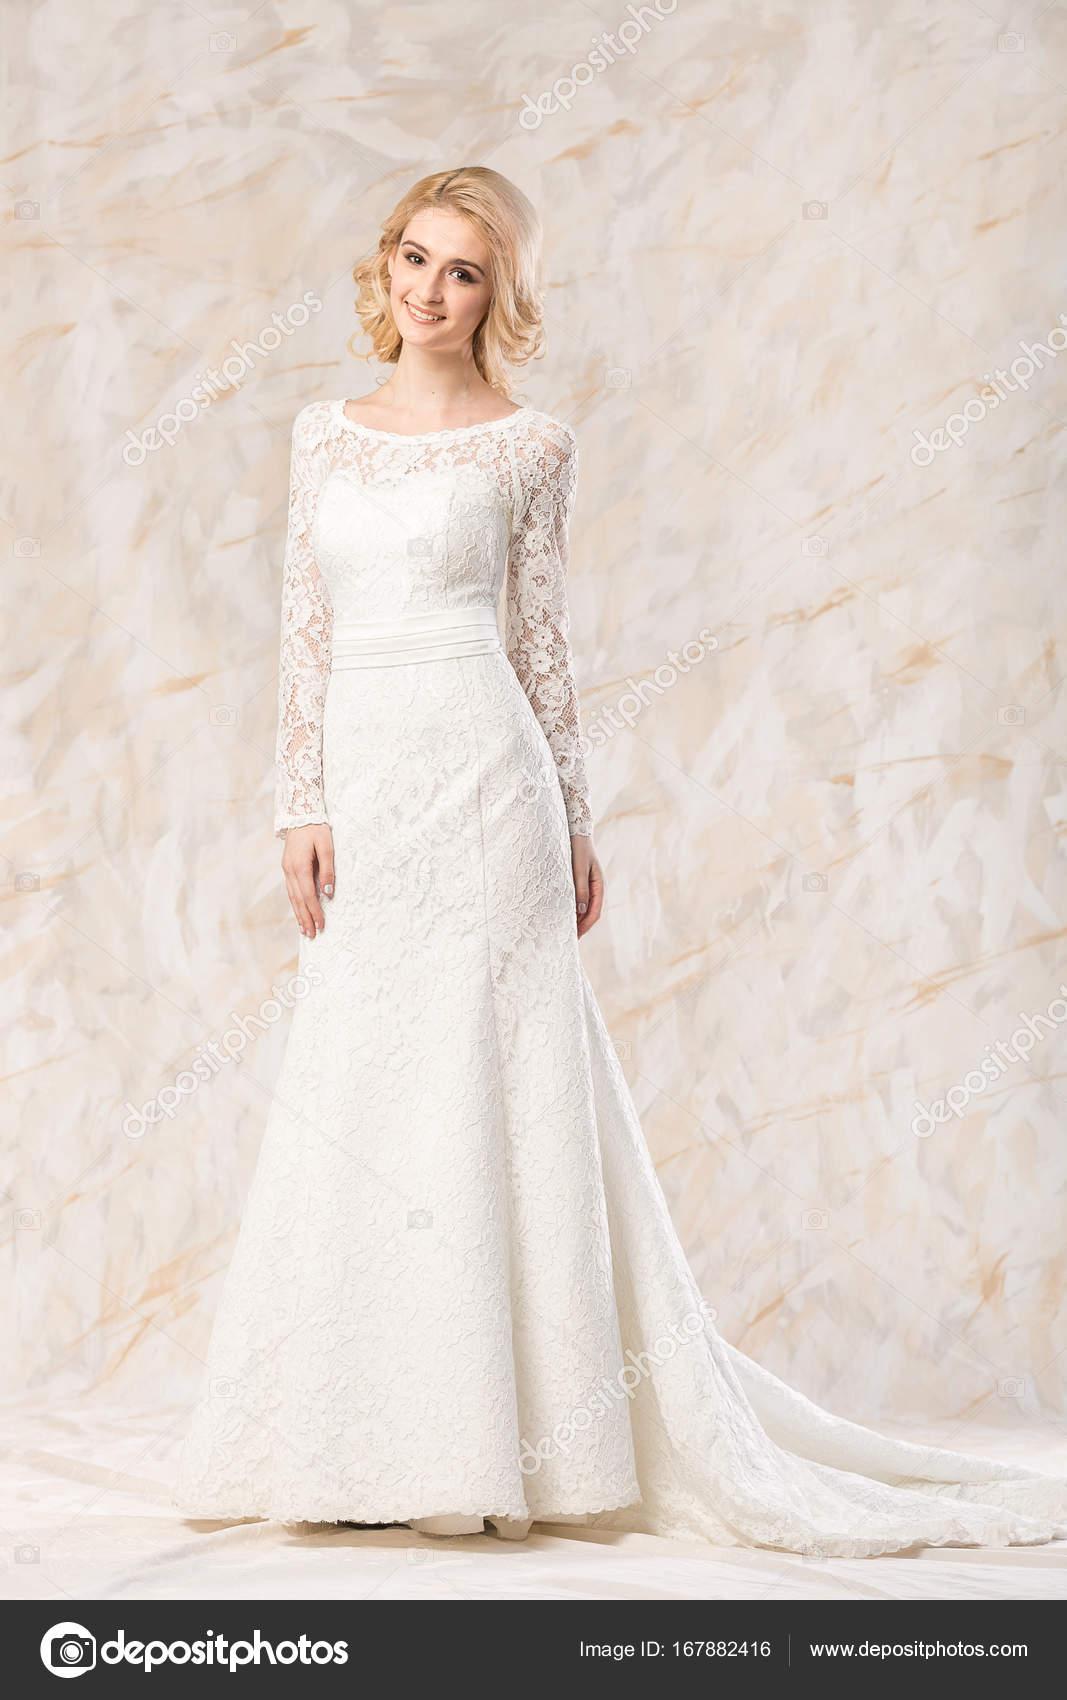 22ec2cf12e42 μοντέρνο λευκό φόρεμα